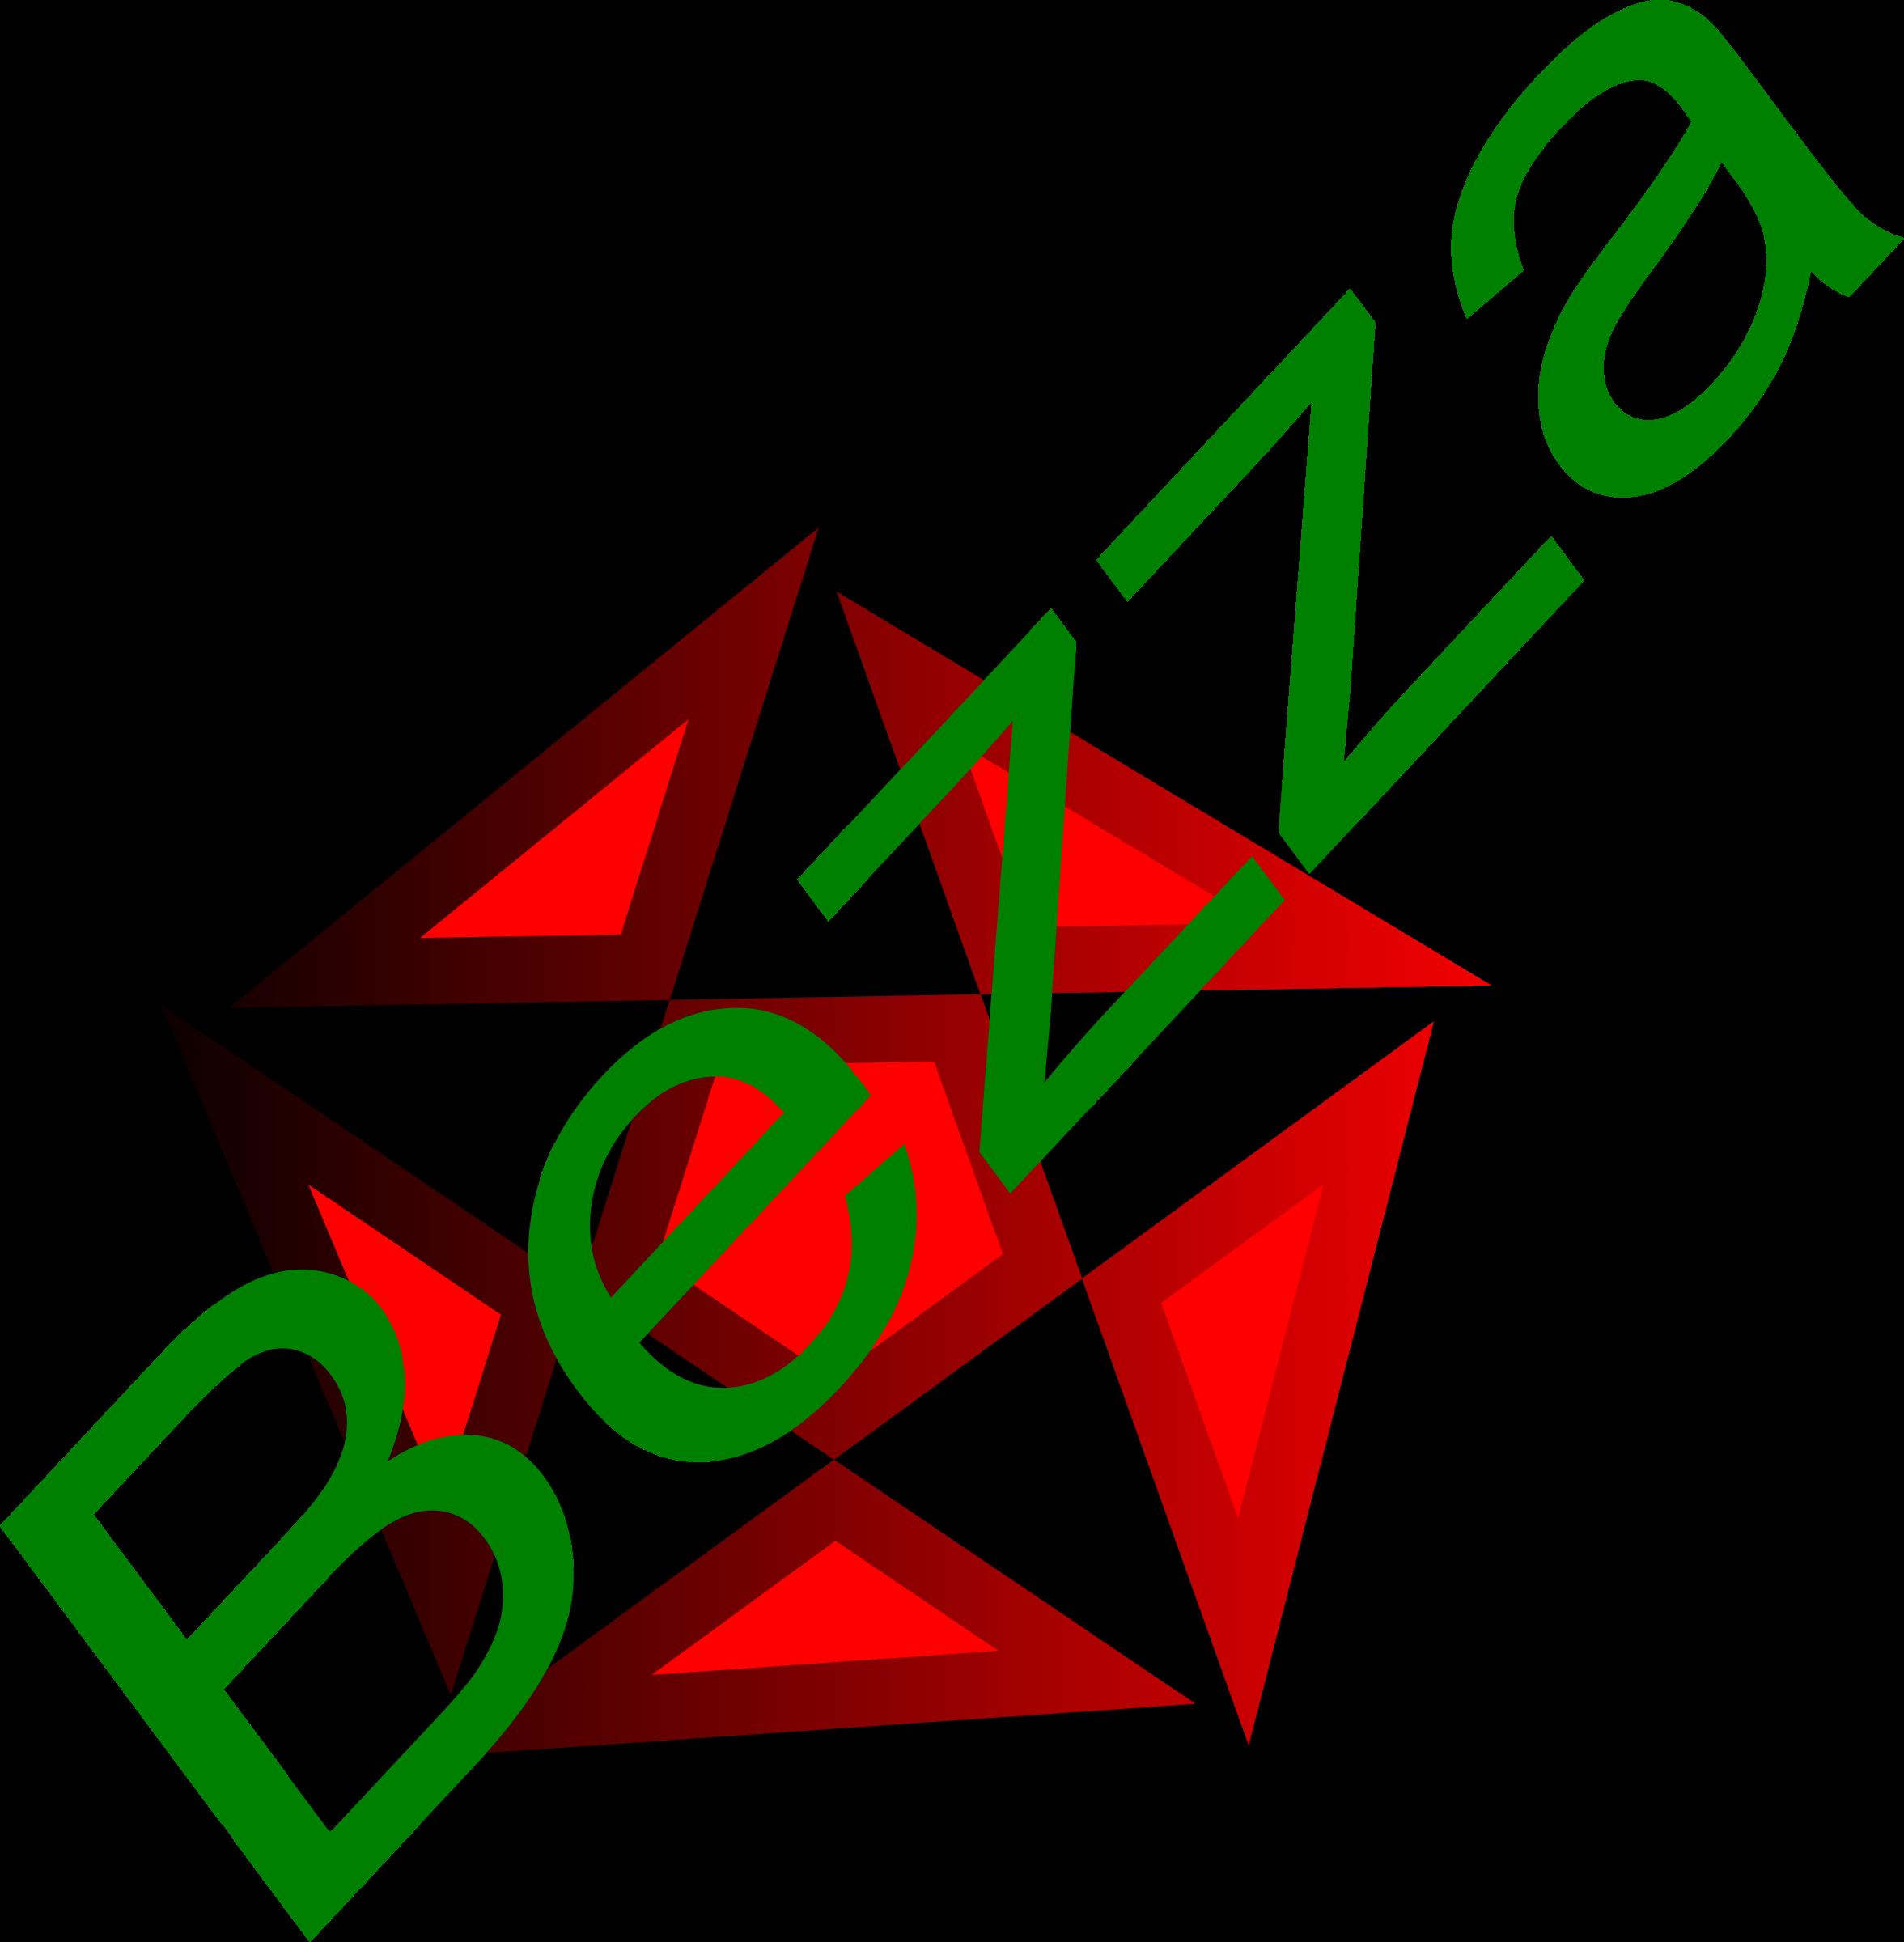 Stellar star clipart vector library stock Clipart - Bezza forum avatar vector library stock